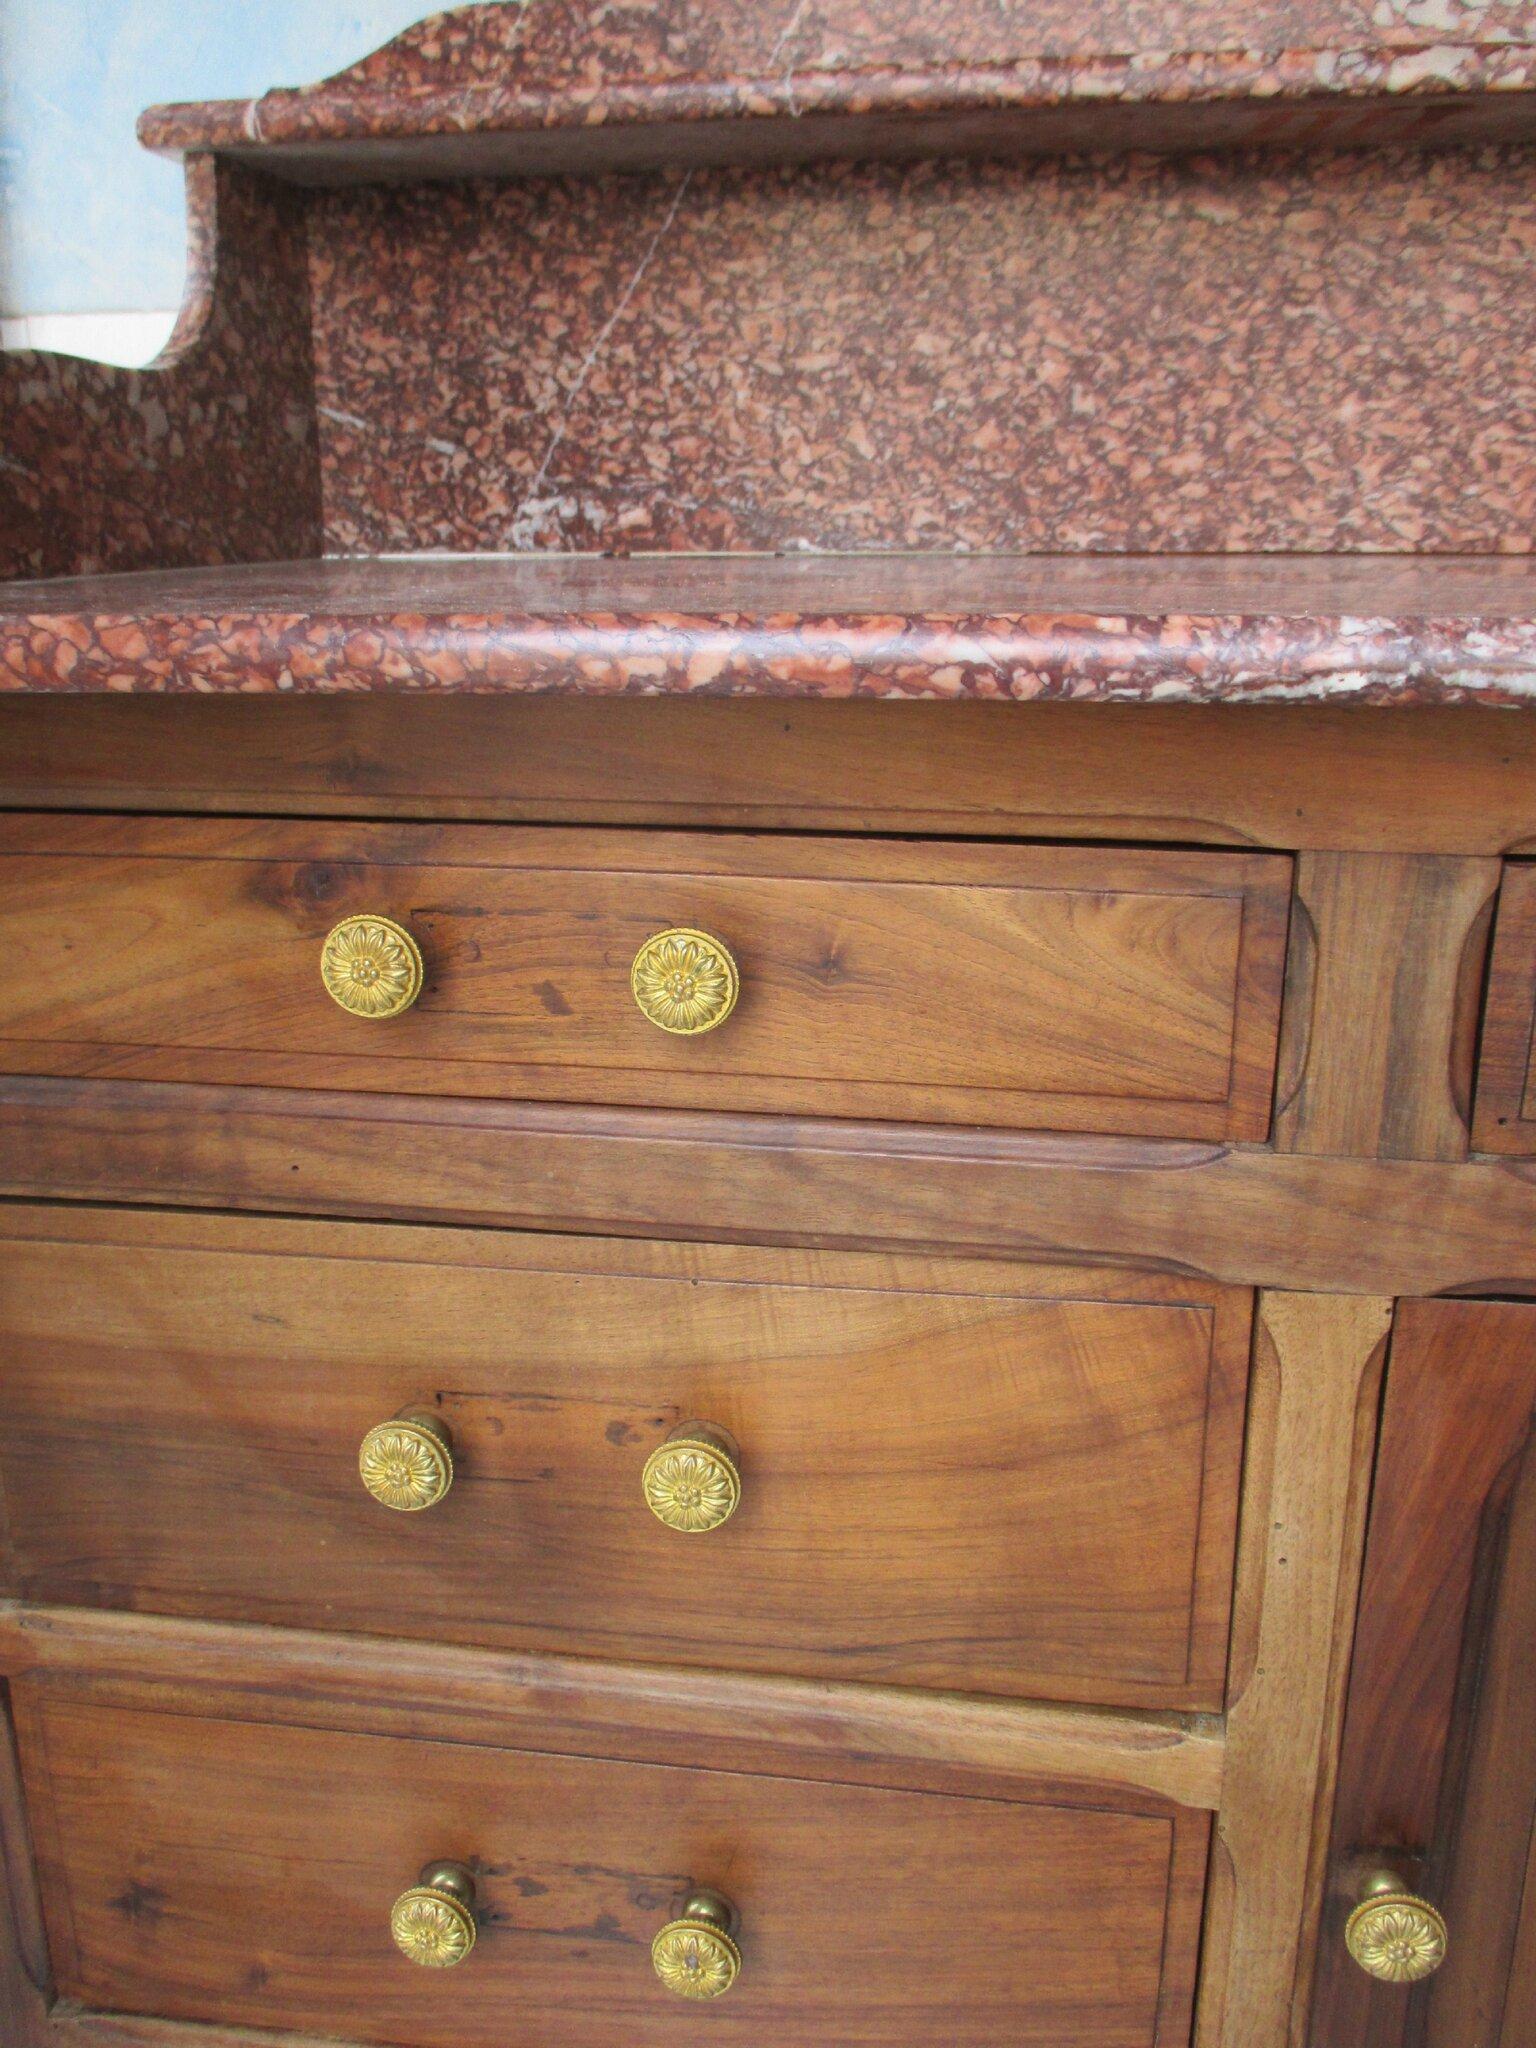 meubles peints bric broc et breloques. Black Bedroom Furniture Sets. Home Design Ideas